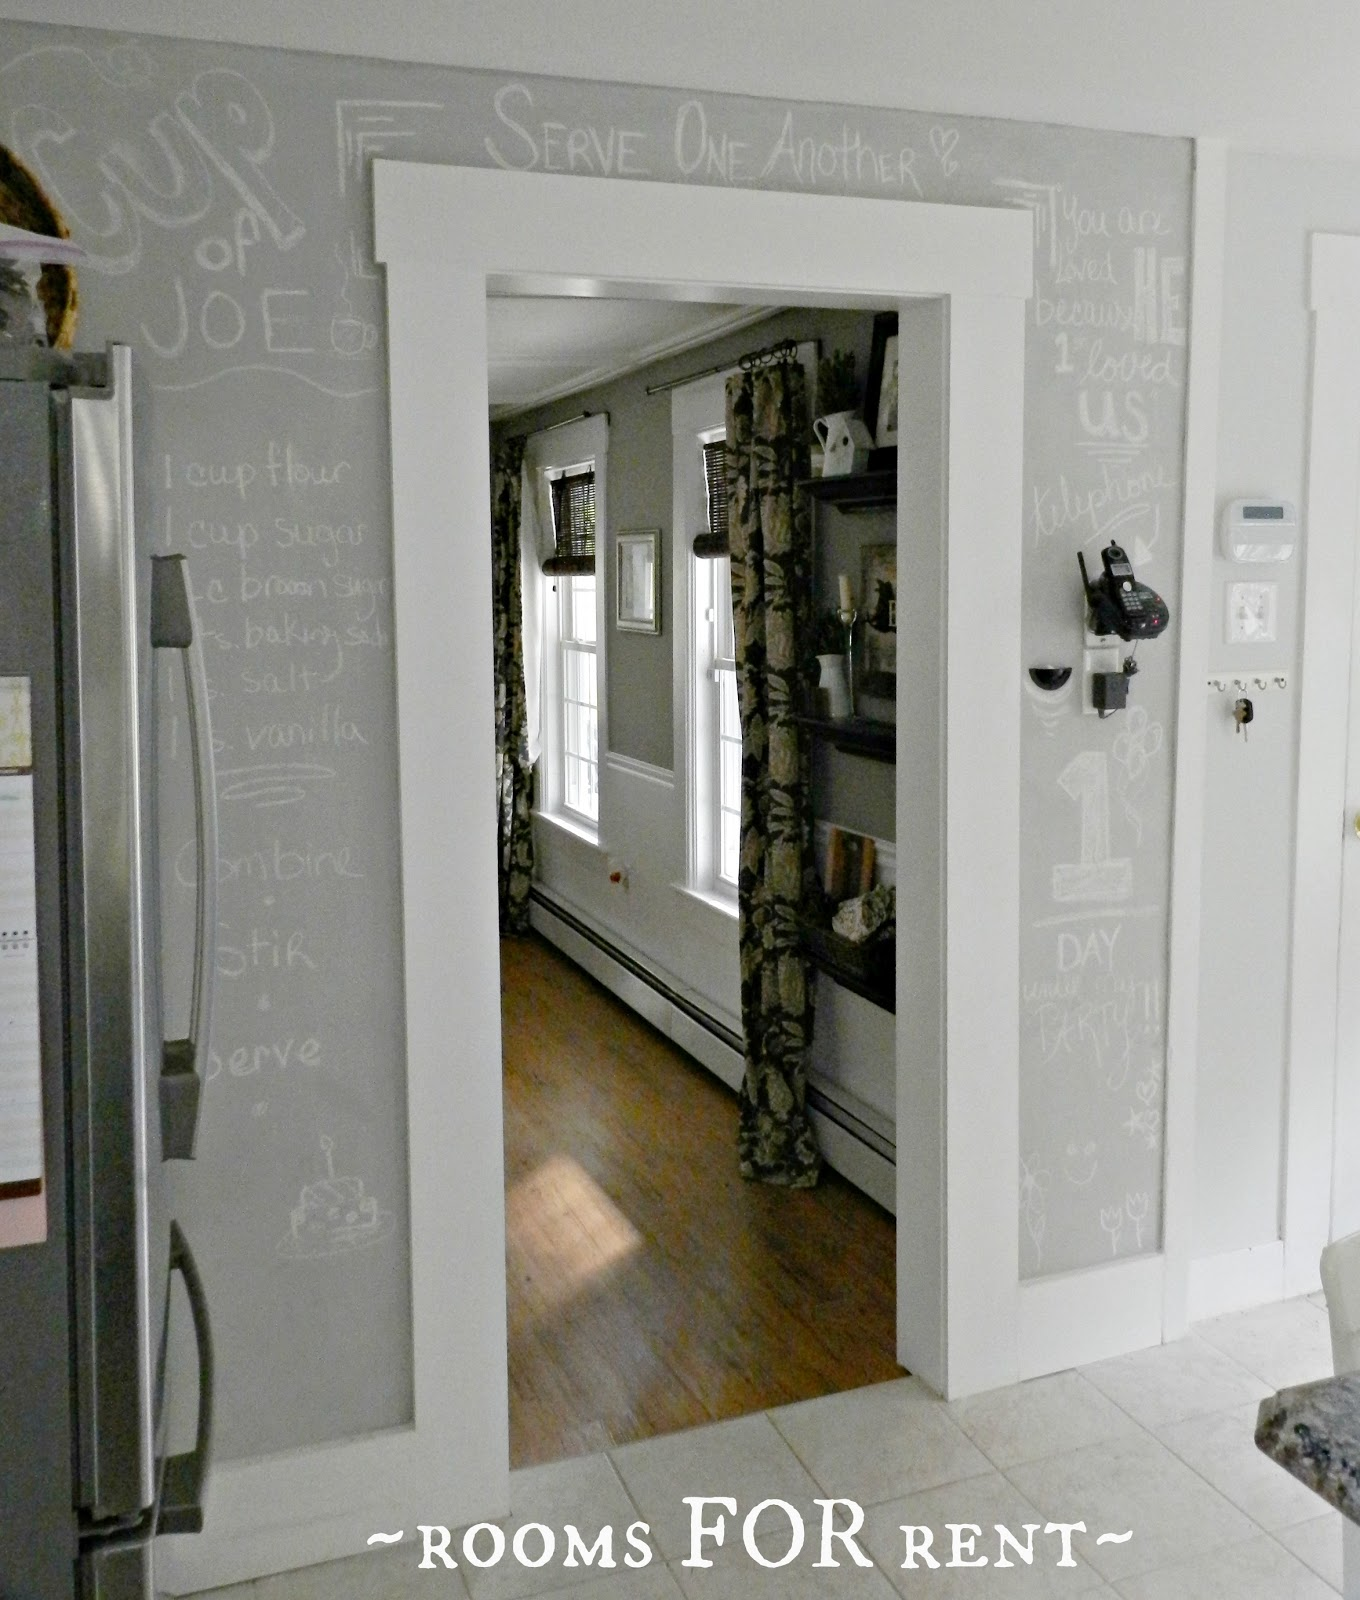 Using wallpaper for flooring wallpapersafari - Can you use laminate flooring in a bathroom ...